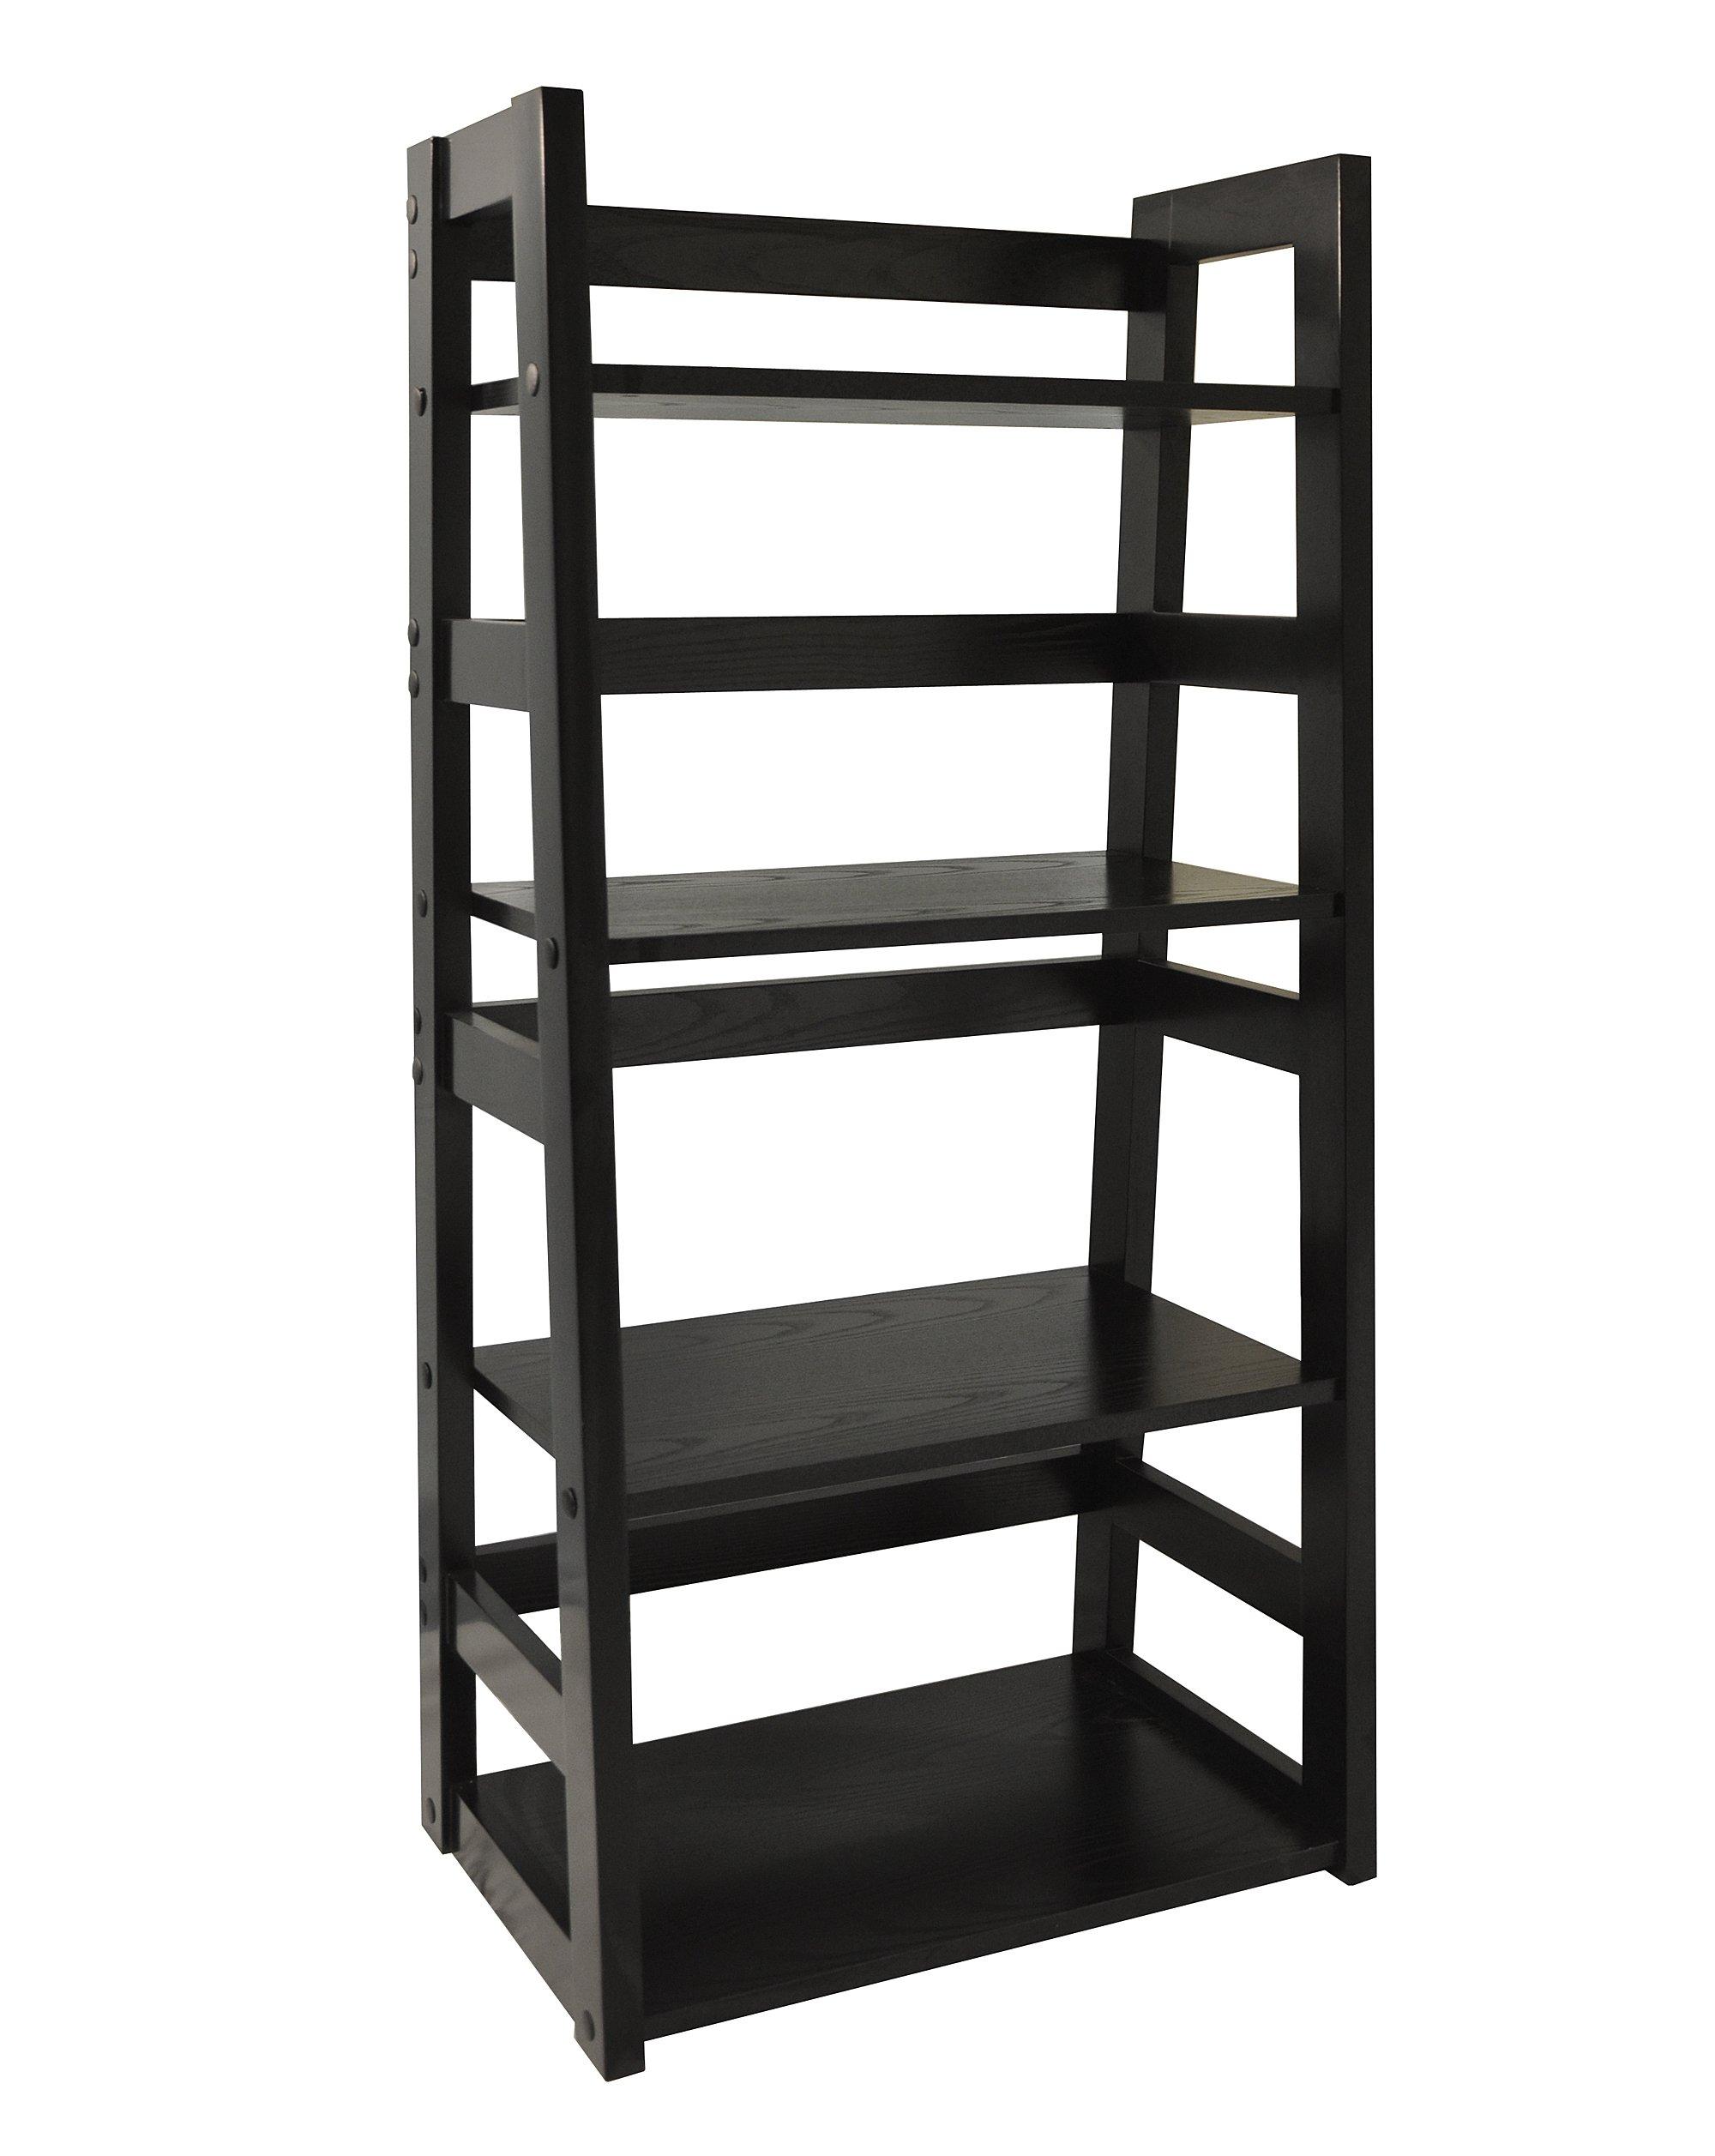 Convenience Concepts Traditional 4-Tier Trestle Bookcase, Black